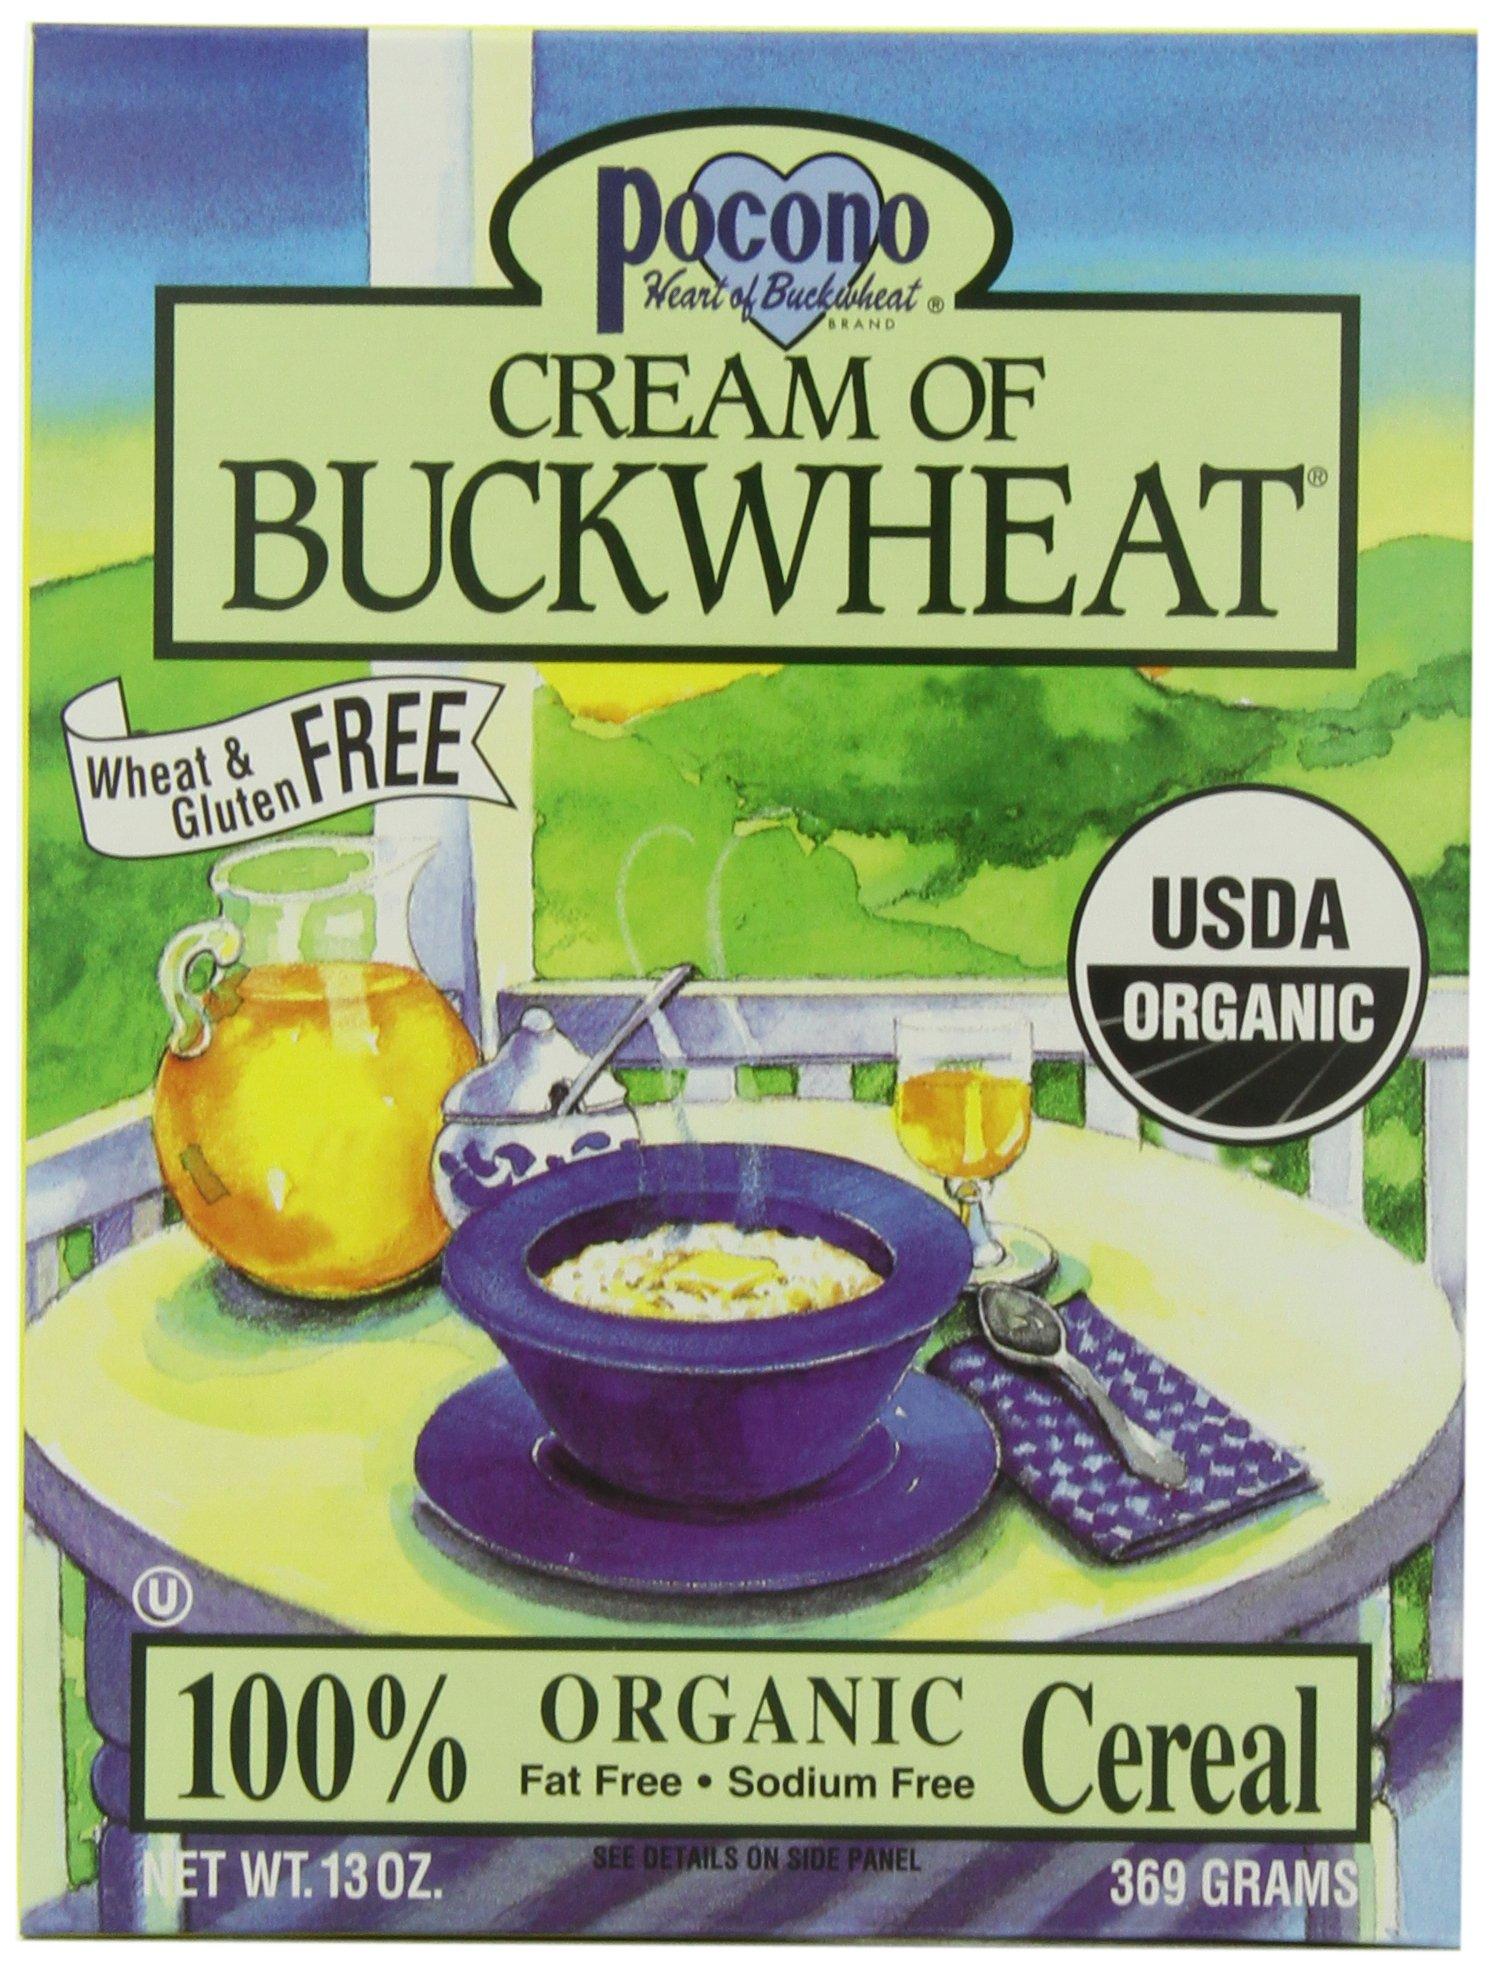 Pocono Cream of Buckwheat Gluten Free Hot Cereal, 13-Ounce (Pack of 3) by Pocono